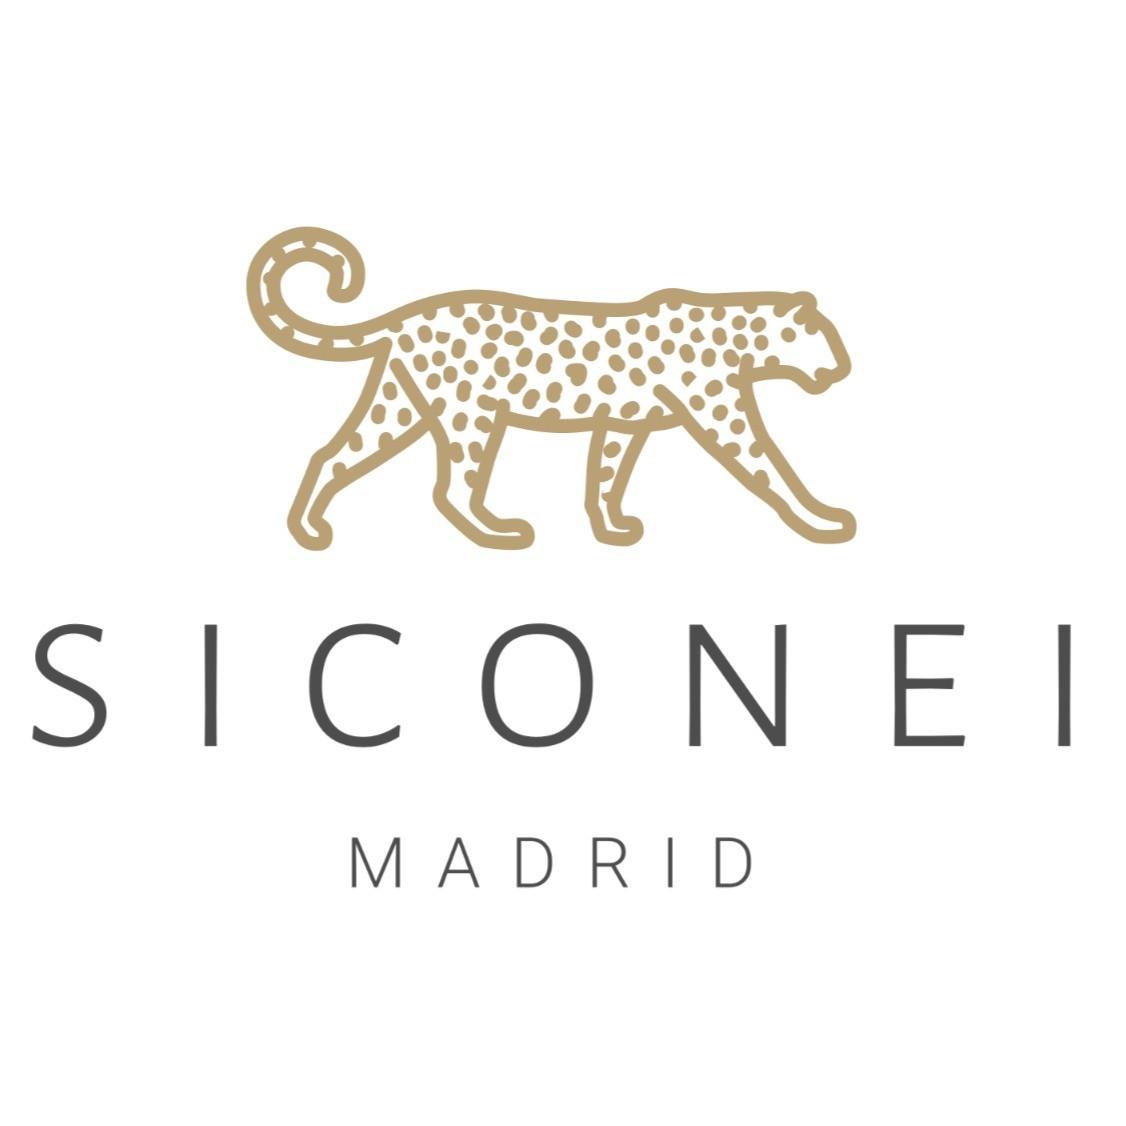 SICONEI